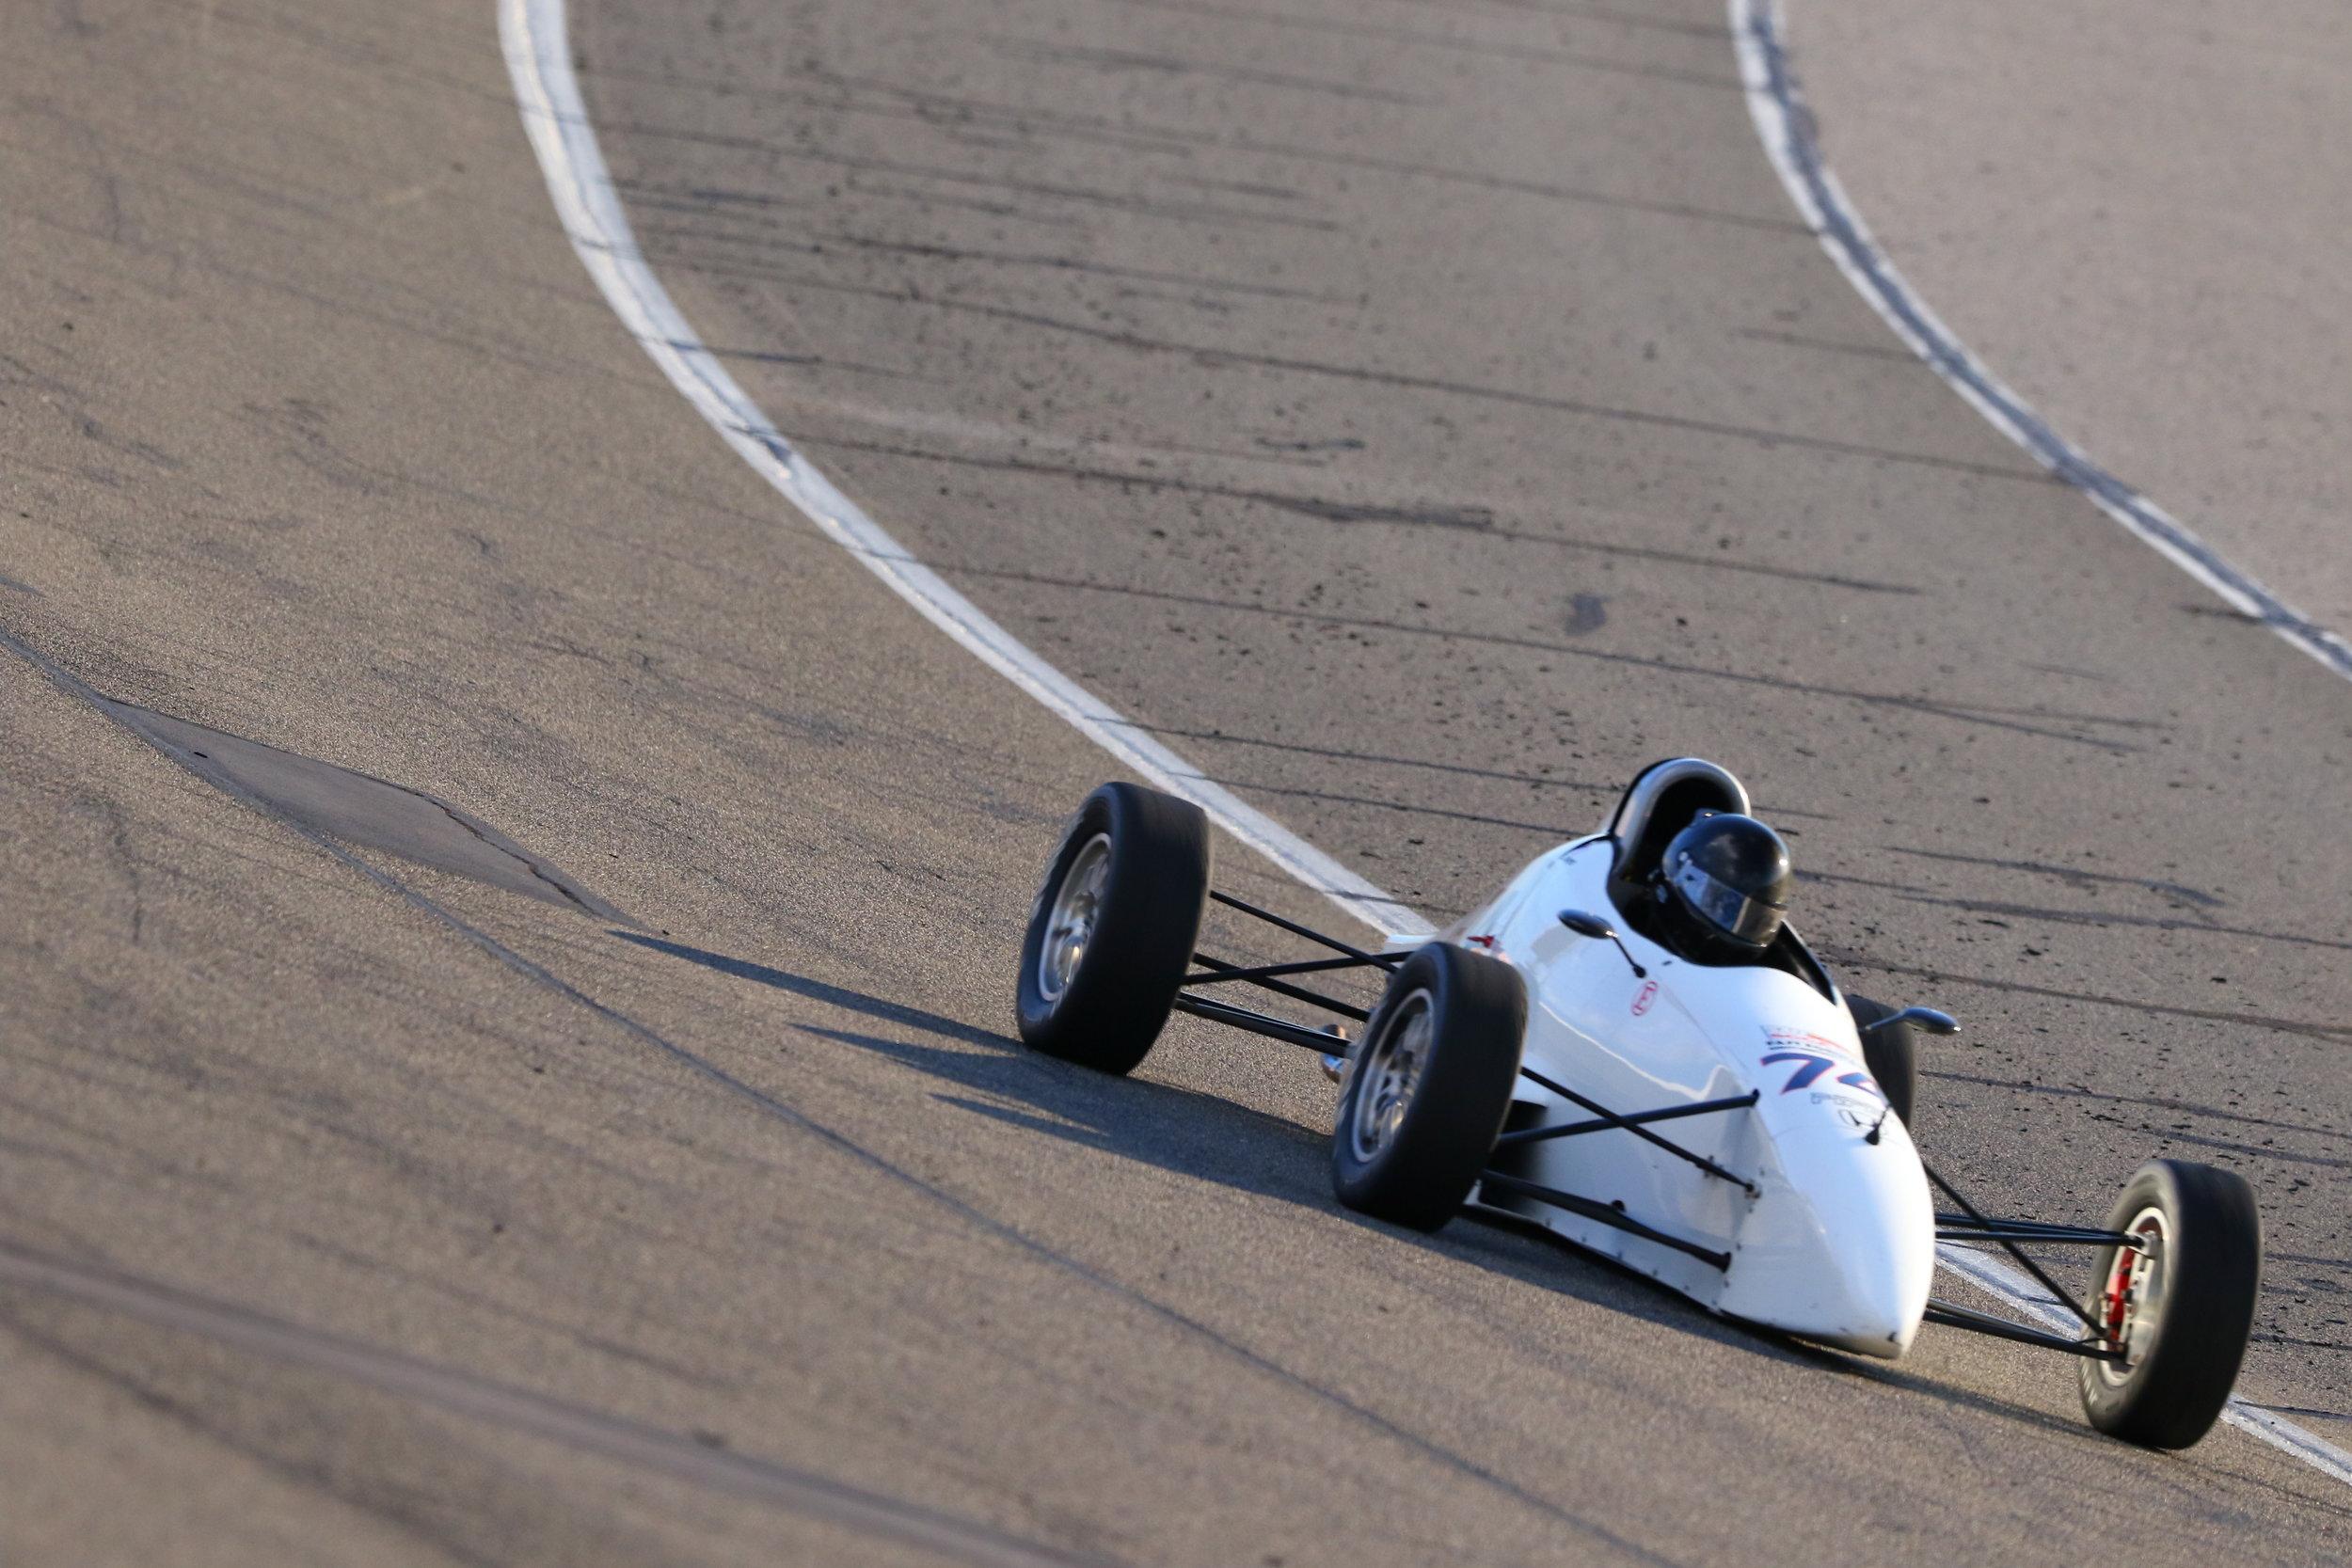 Jan-14-2017-SCCA Majors - Group 6 - Race (Turn 2) - AC2_1874_Jan1417_CaliPhoto.jpg